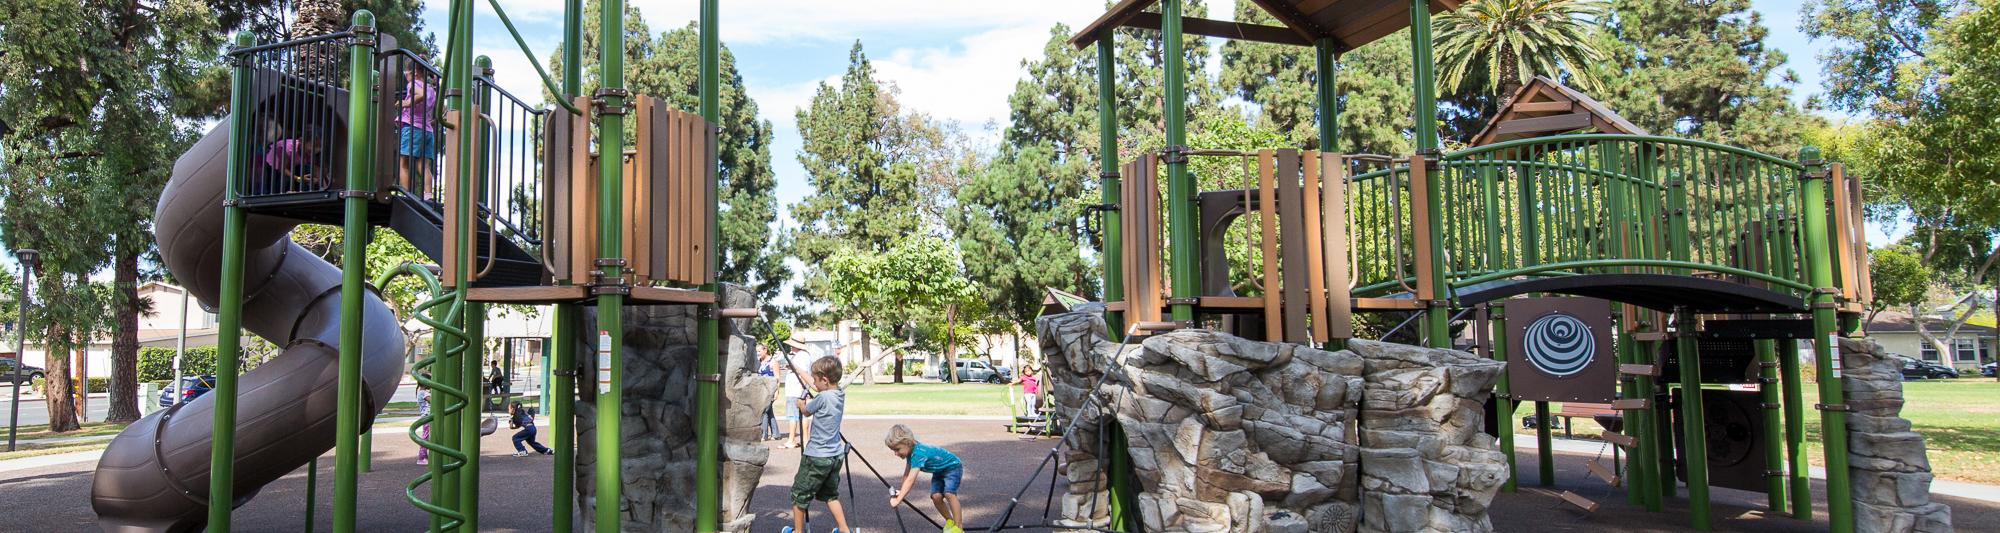 Resevoir Park Playground